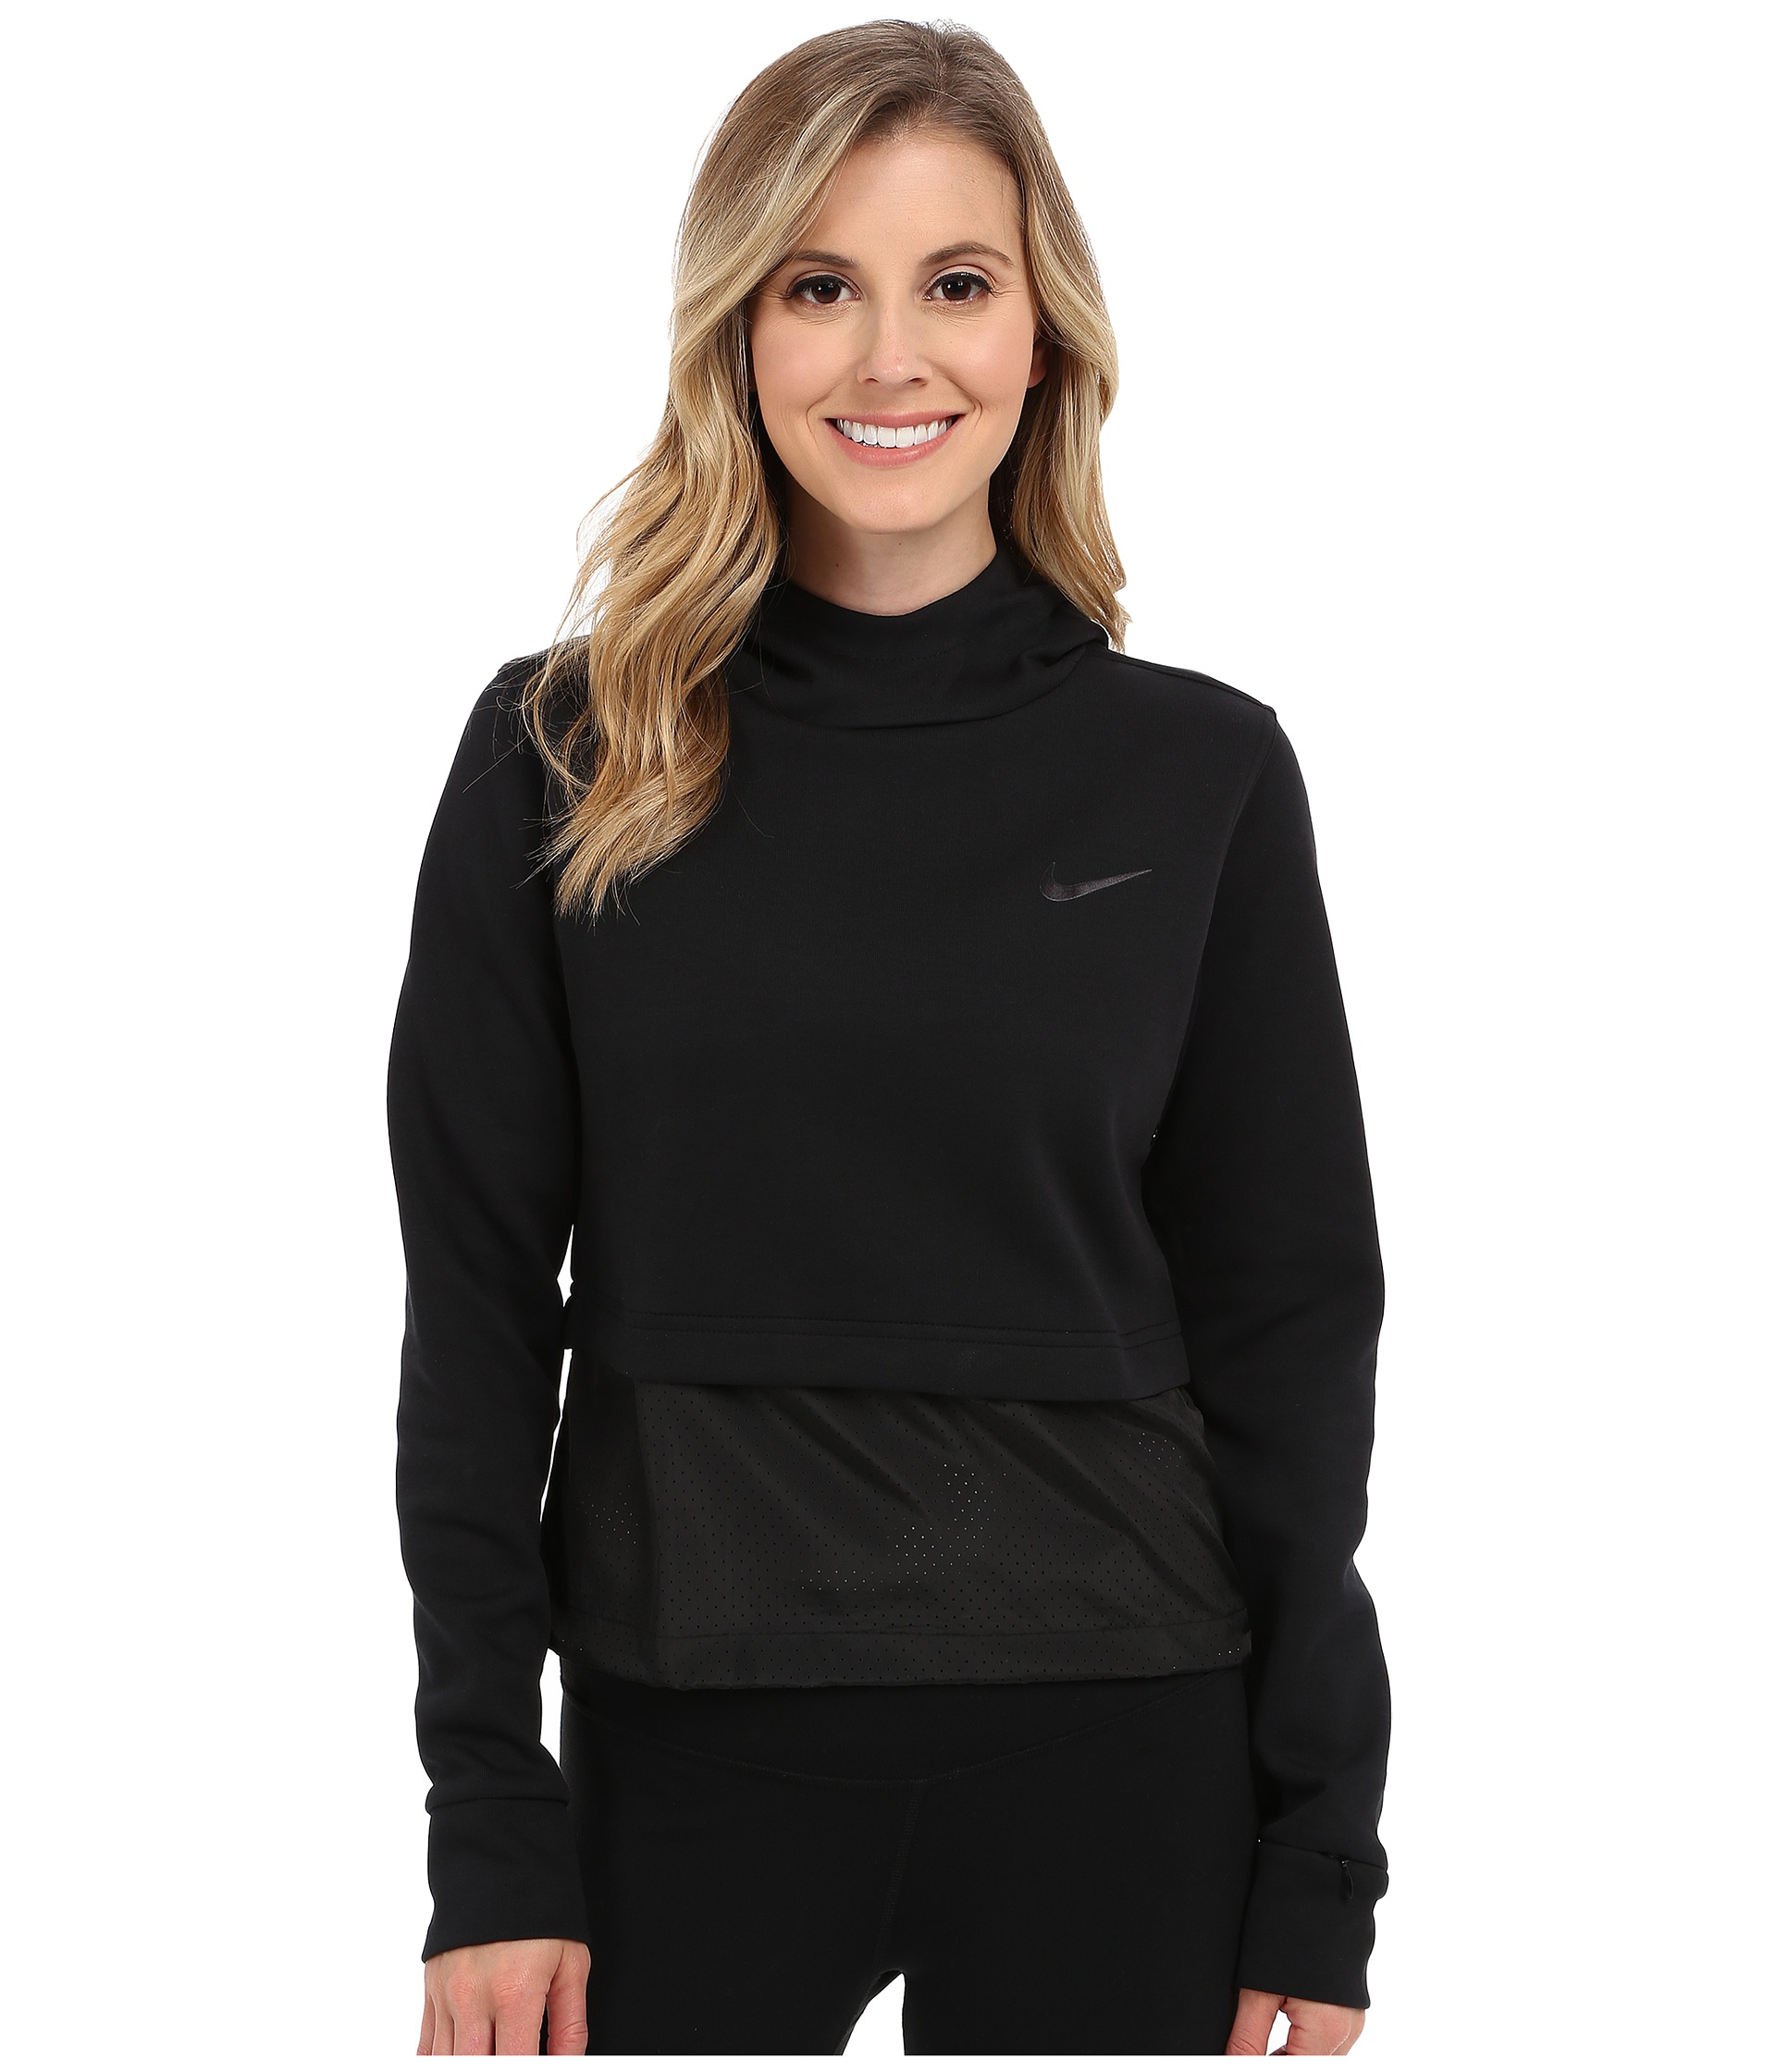 vuelo femme air jordan - Nike Advance 15 Fleece Hoodie - 6pm.com